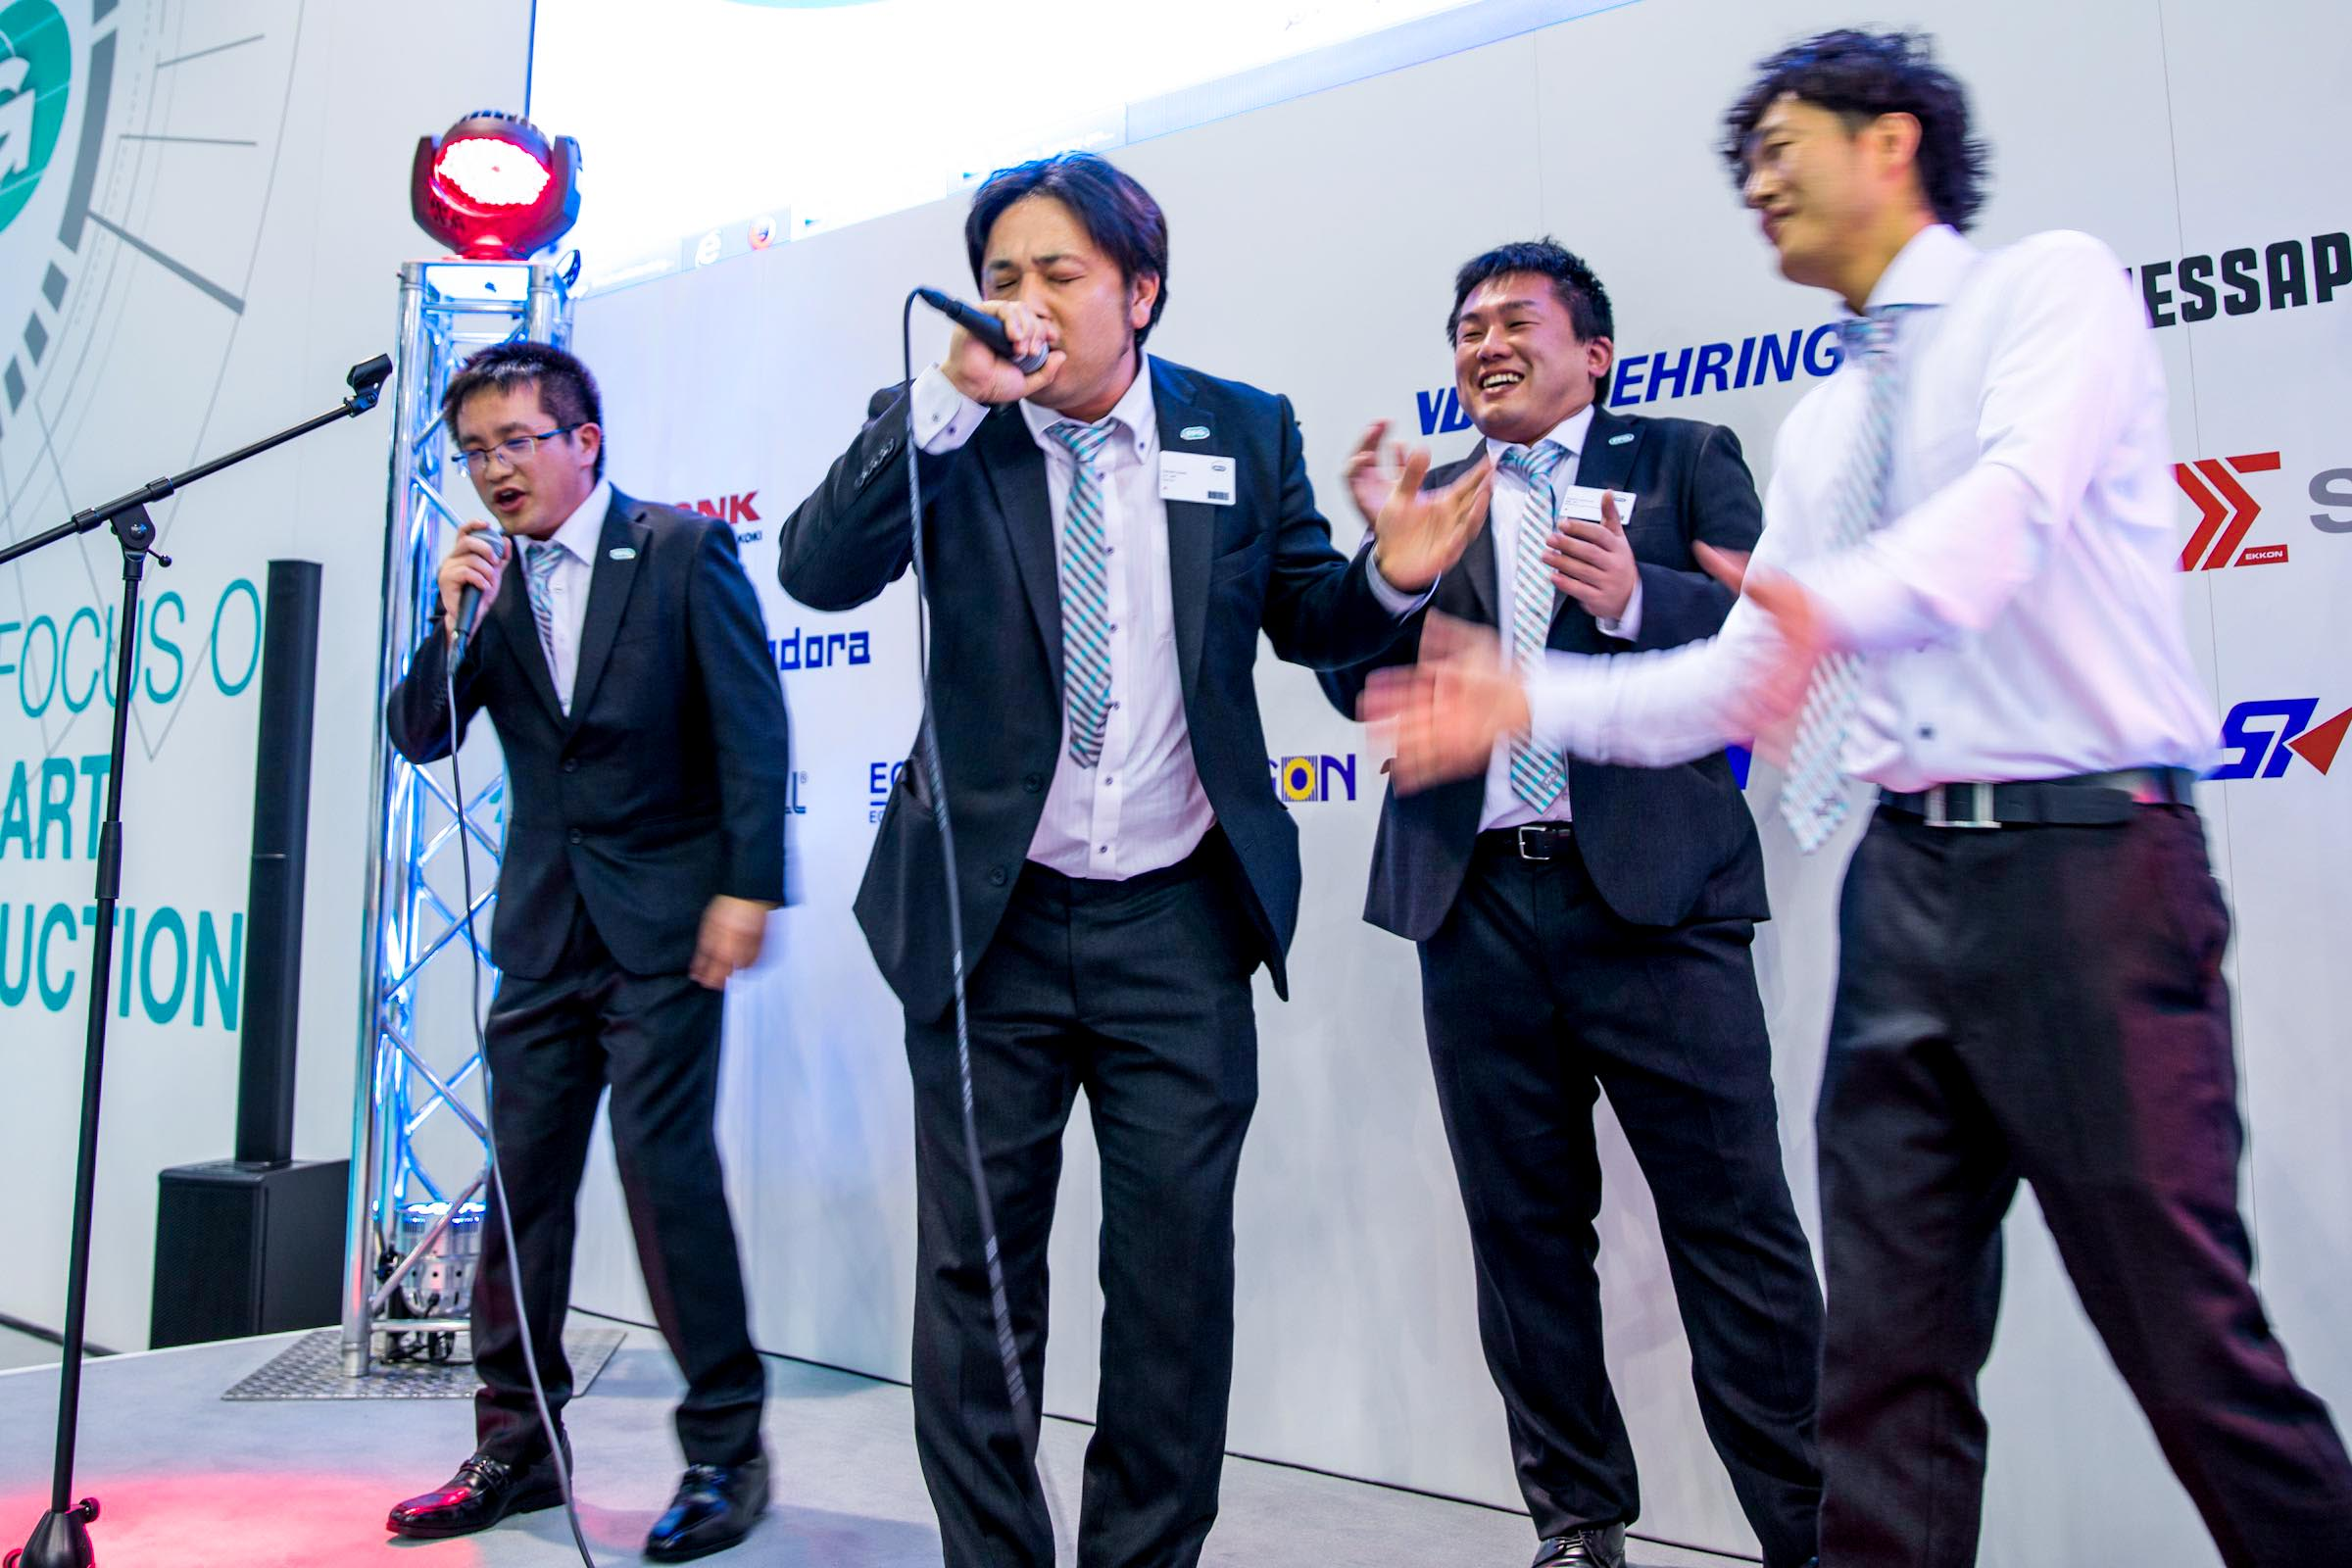 Karaoke | Anlage | Karaoke | Maschine | Karaoke | Automat | Karaokeanlage | Technik | Karaoke | Songs | Karaoke | Gerät | Leihen | Buchen | Mieten | Lehmann | Eventservice | Hannover